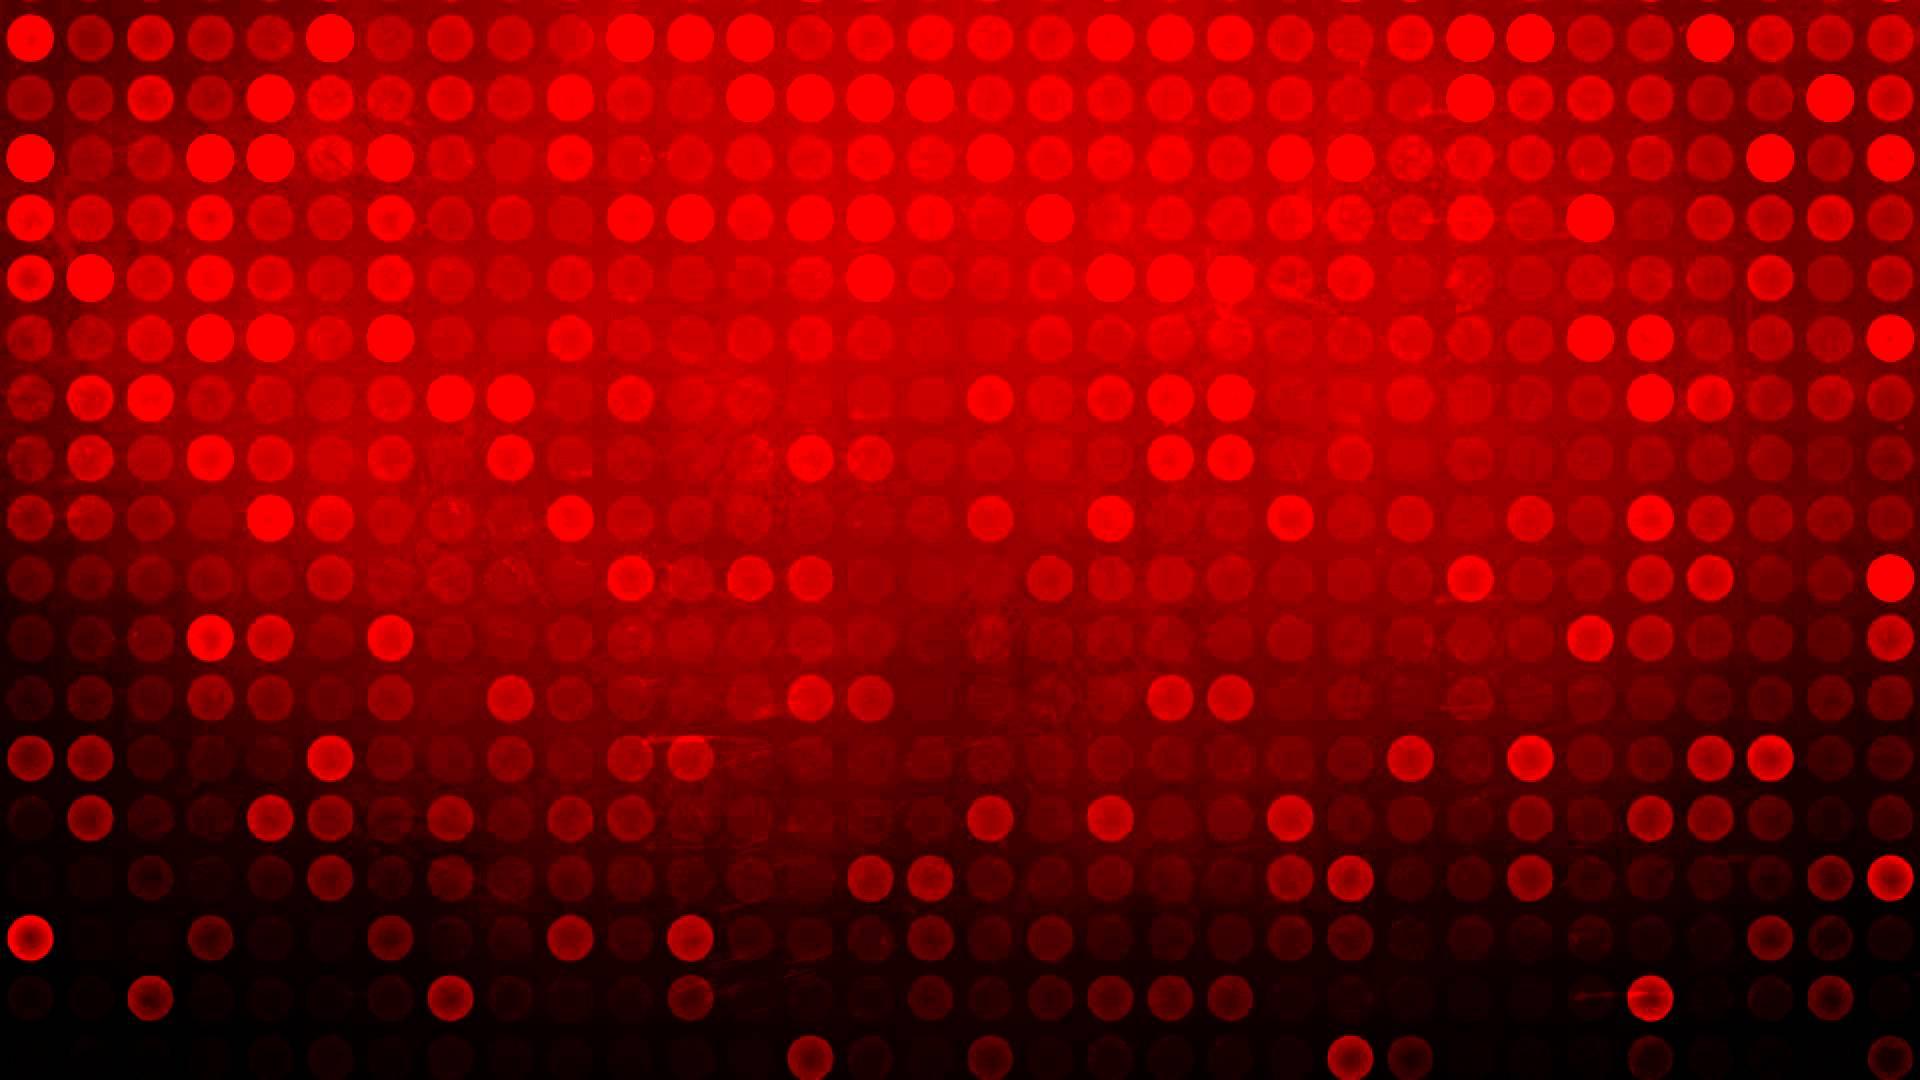 Red Wallpaper PC Desktop 6373 Wallpaper Cool Walldiskpapercom 1920x1080